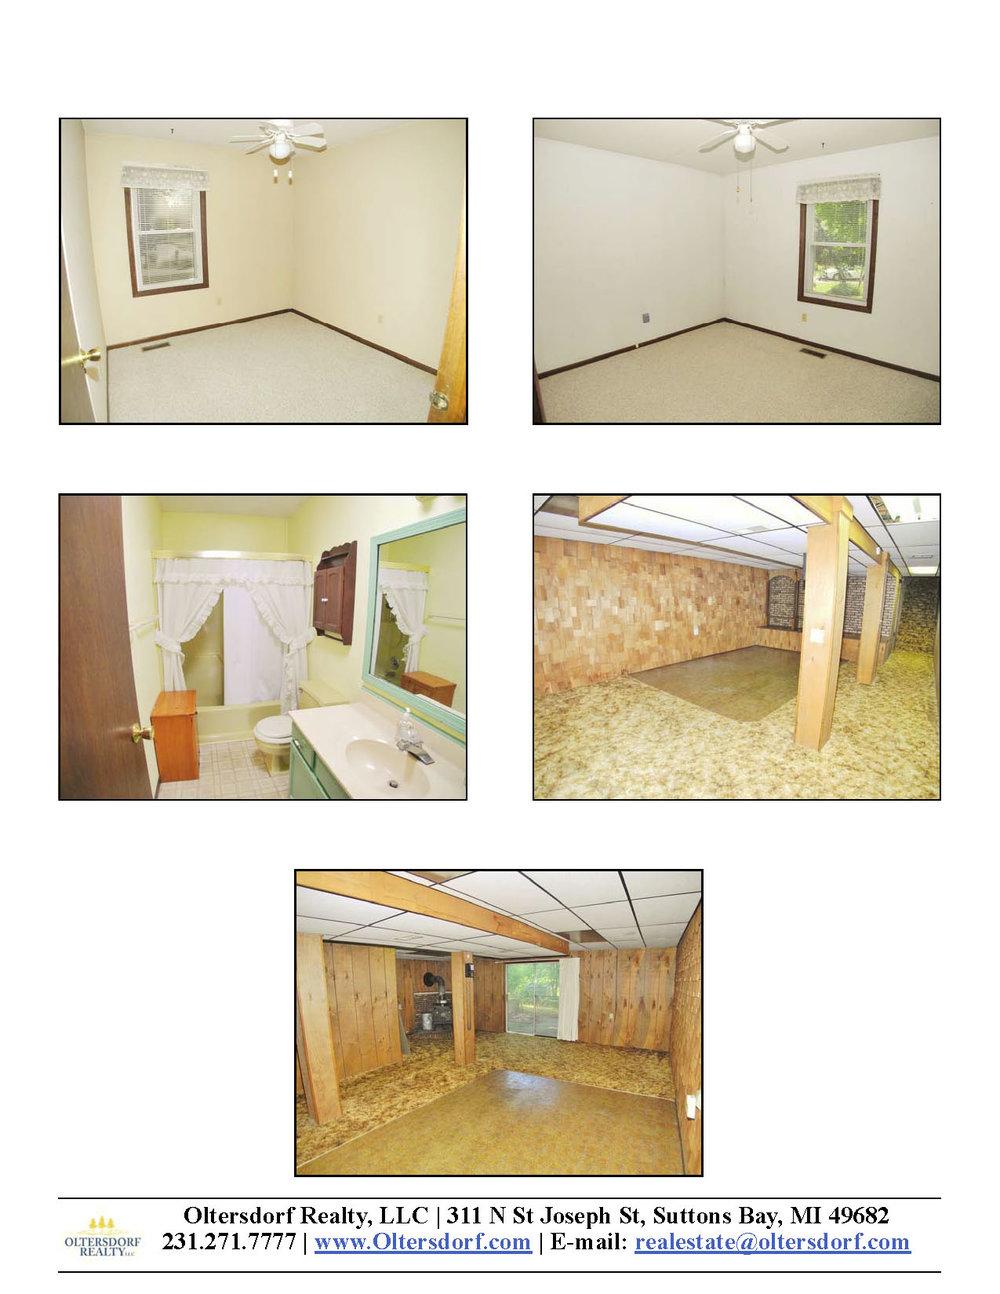 4903 Waldon Circle, Traverse City, MI – 3 Bedroom & 2 Bath Ranch Home for sale by Oltersdorf Realty LLC marketing packet (5).jpg